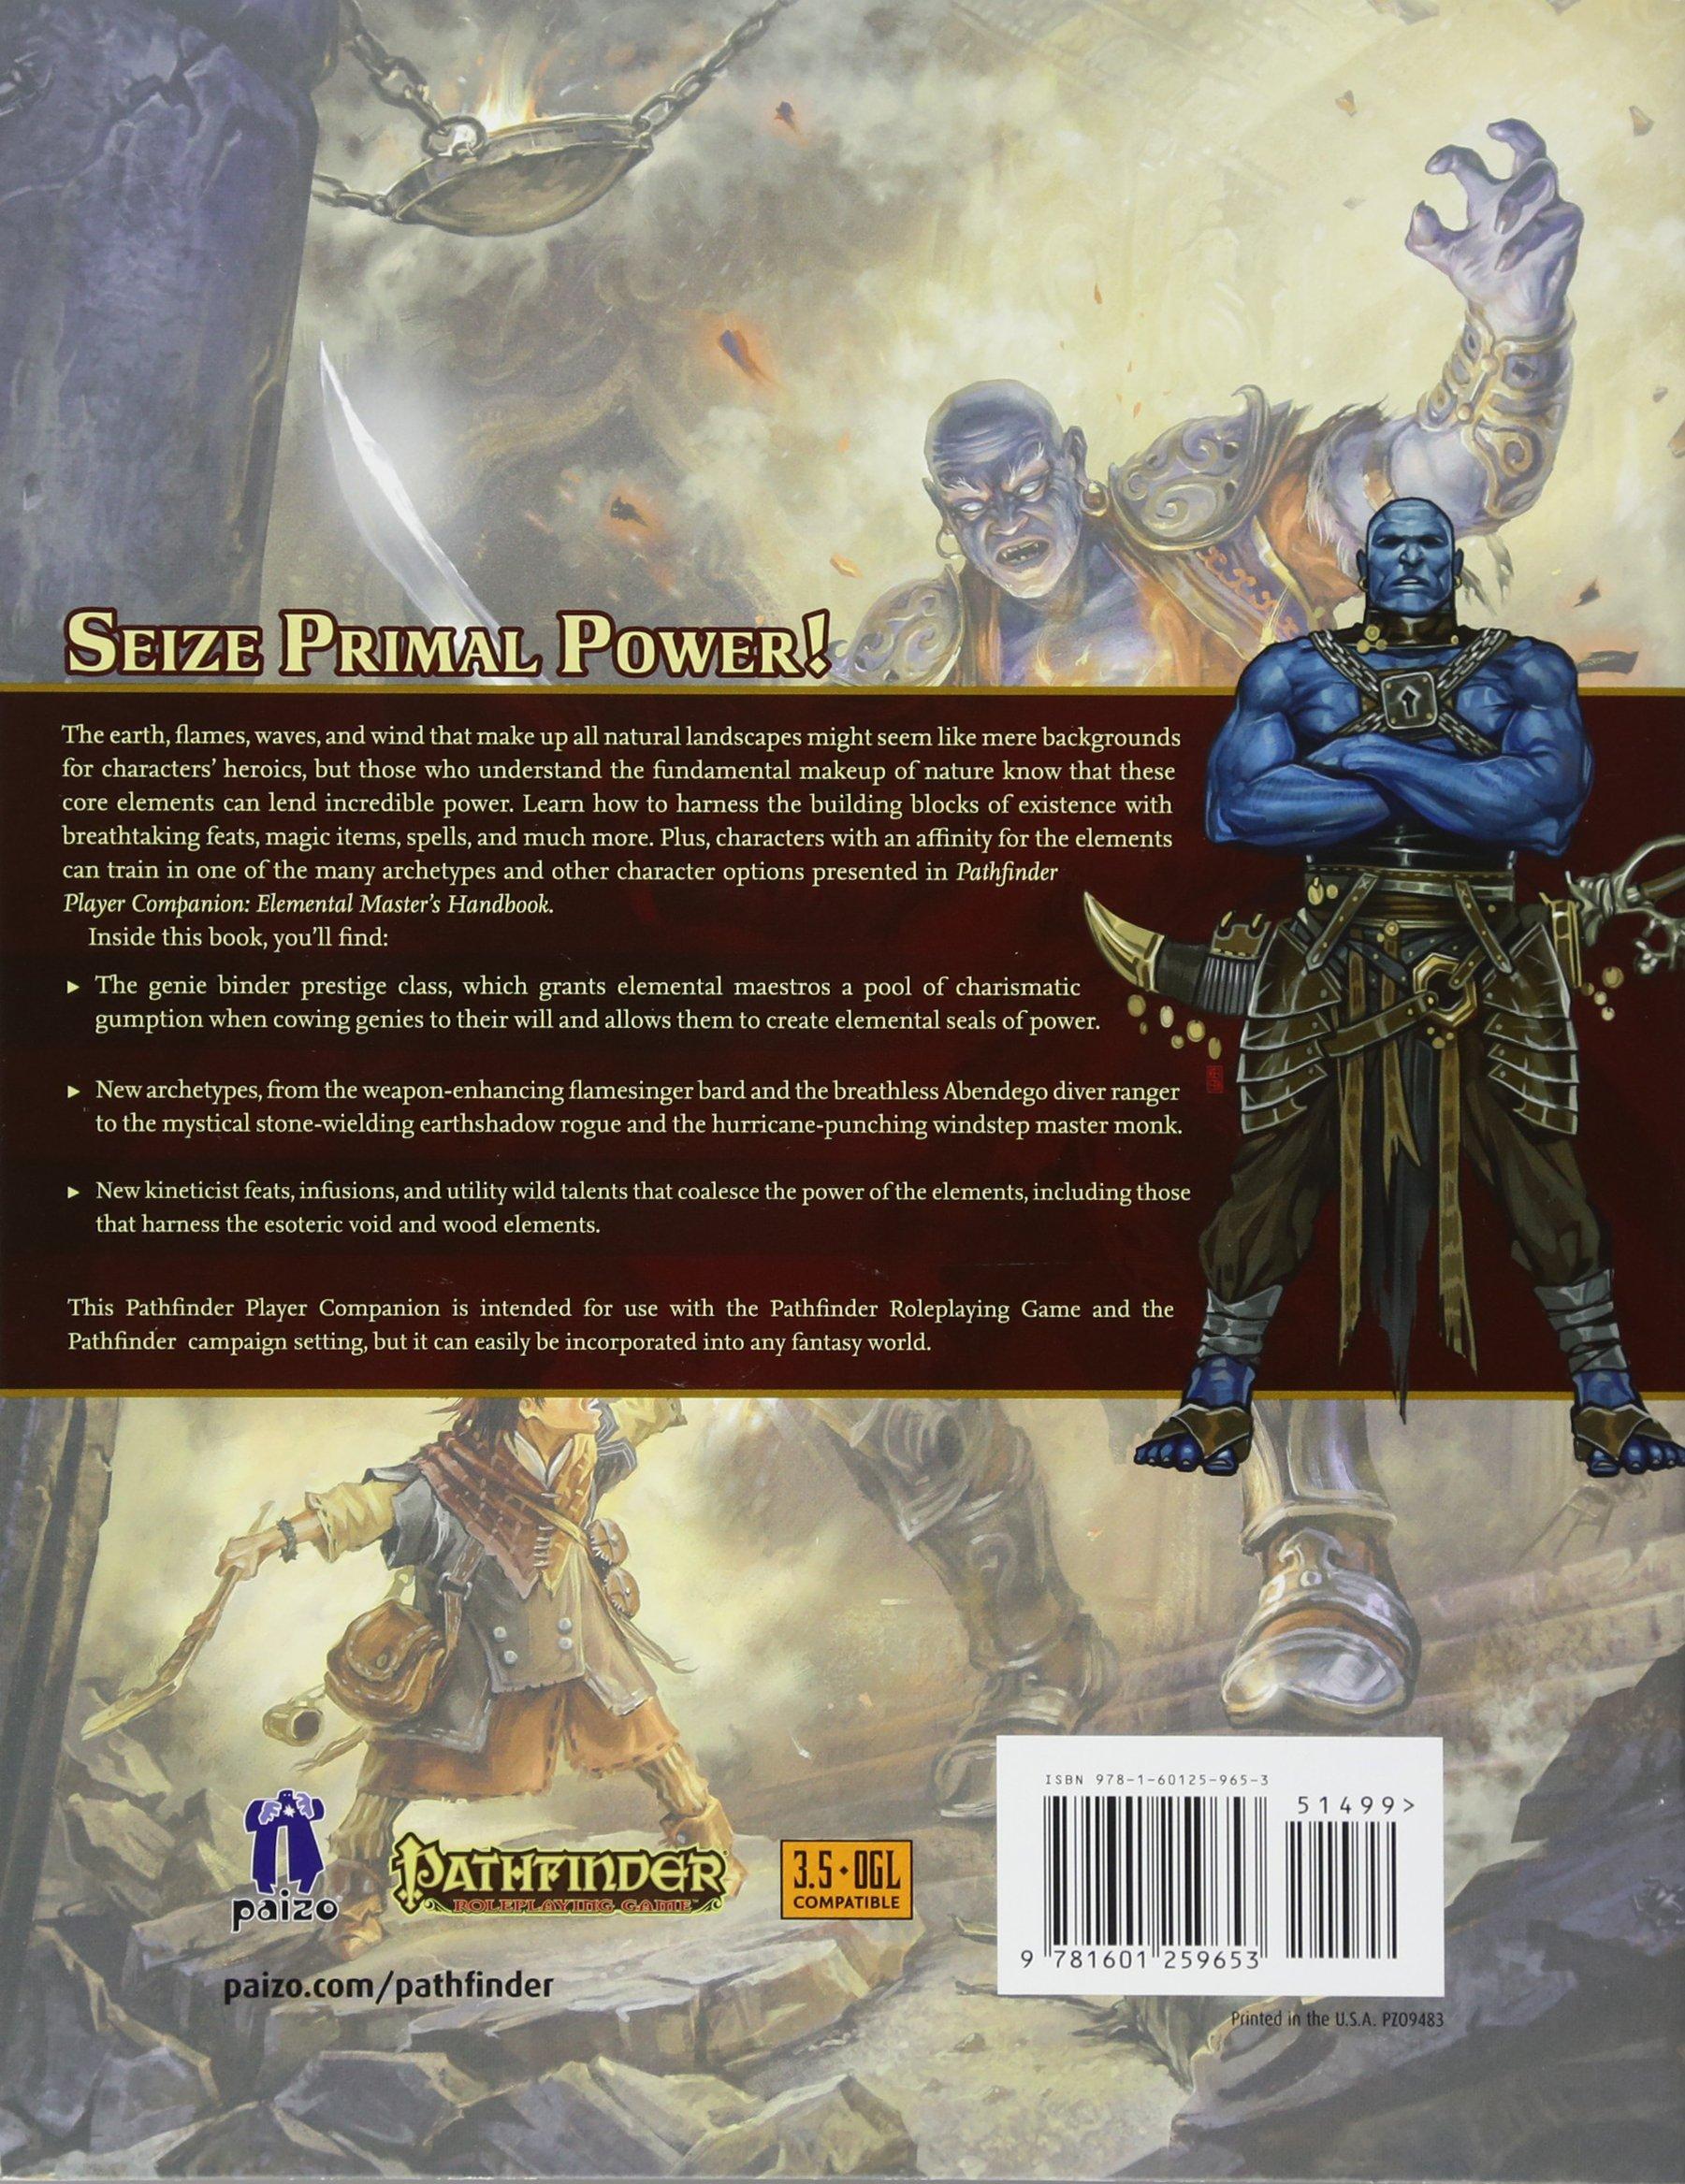 Pathfinder Player Companion: Elemental Master's Handbook: Paizo